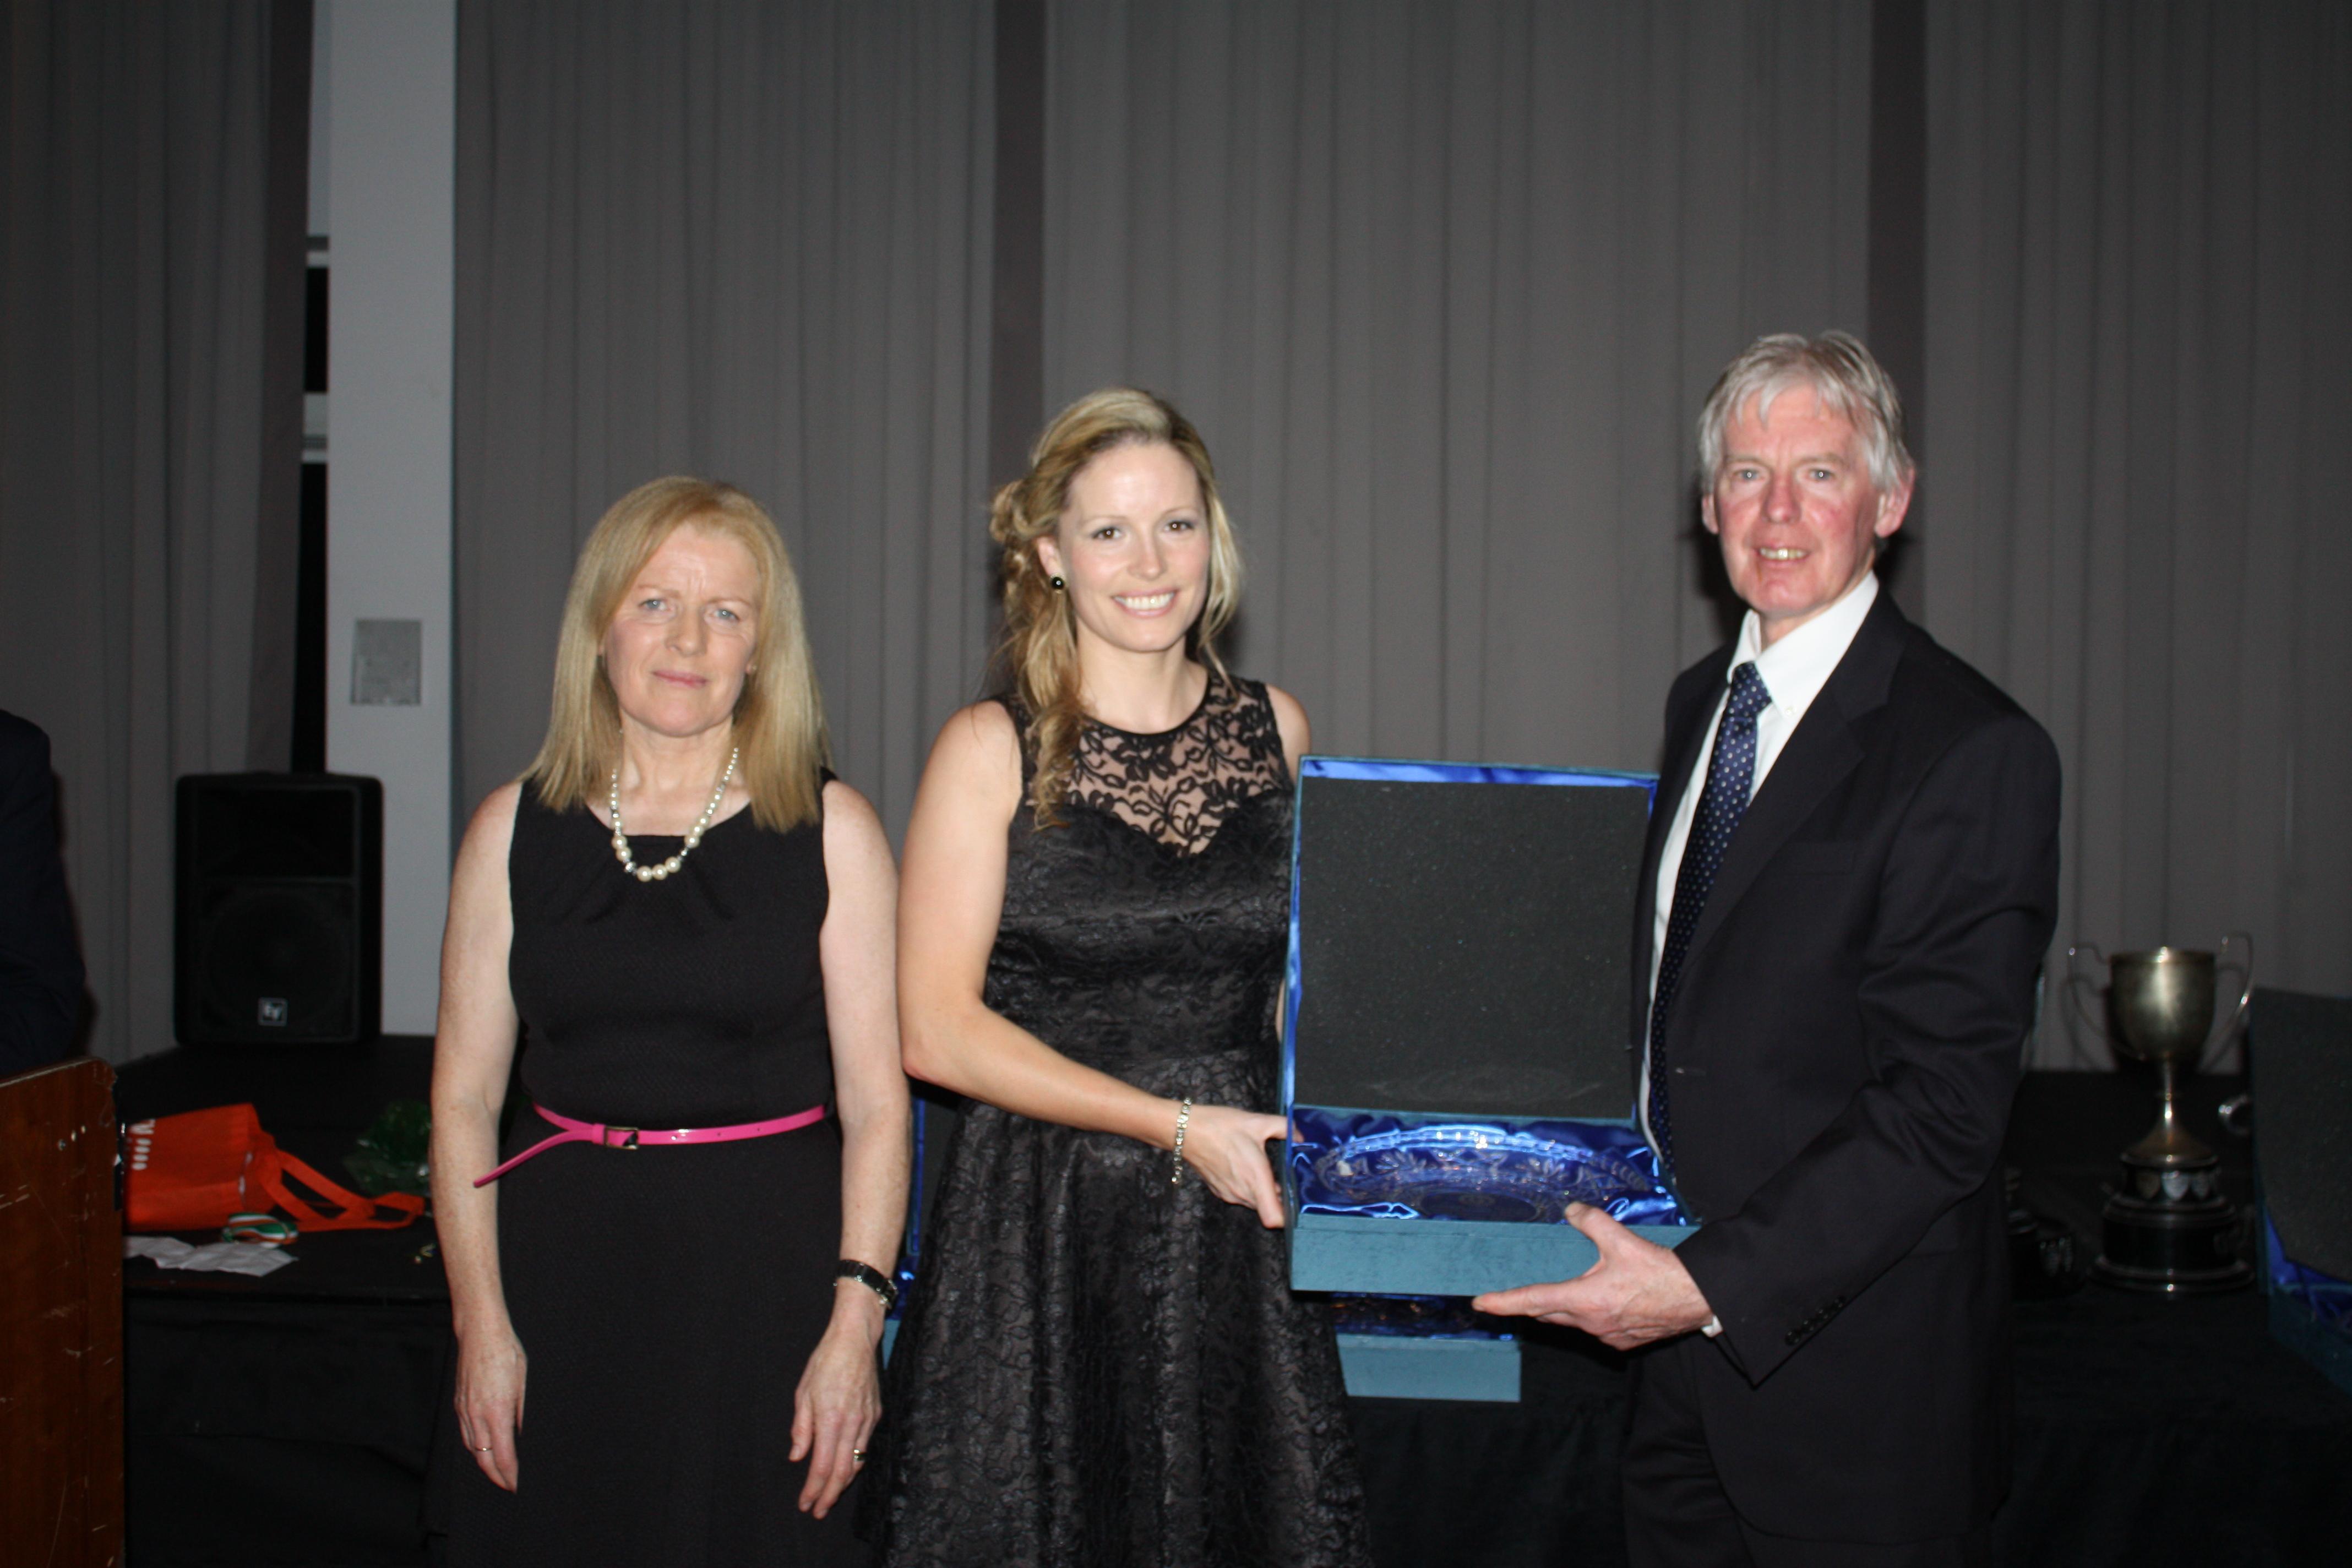 st-finbarrs-awards-night-2012-025